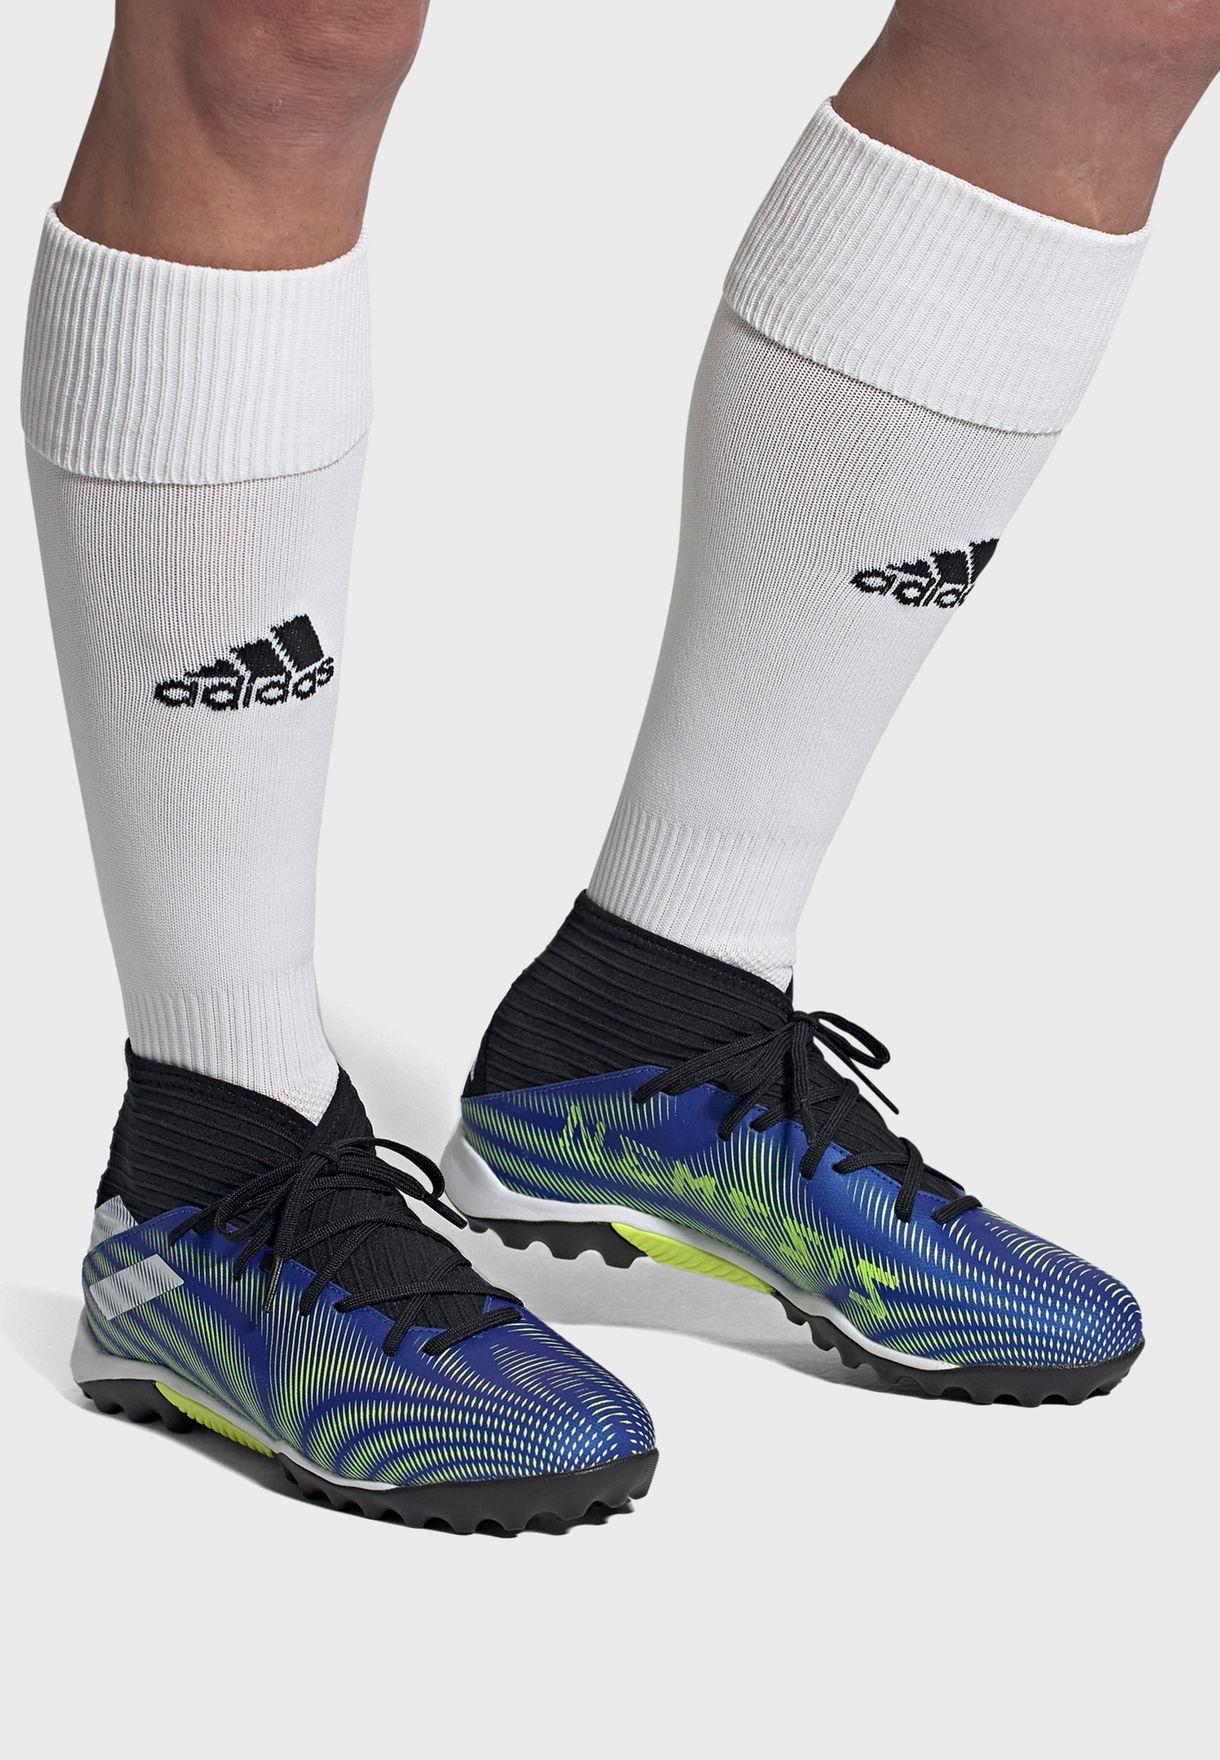 حذاء نيميزيز 3 تيرف